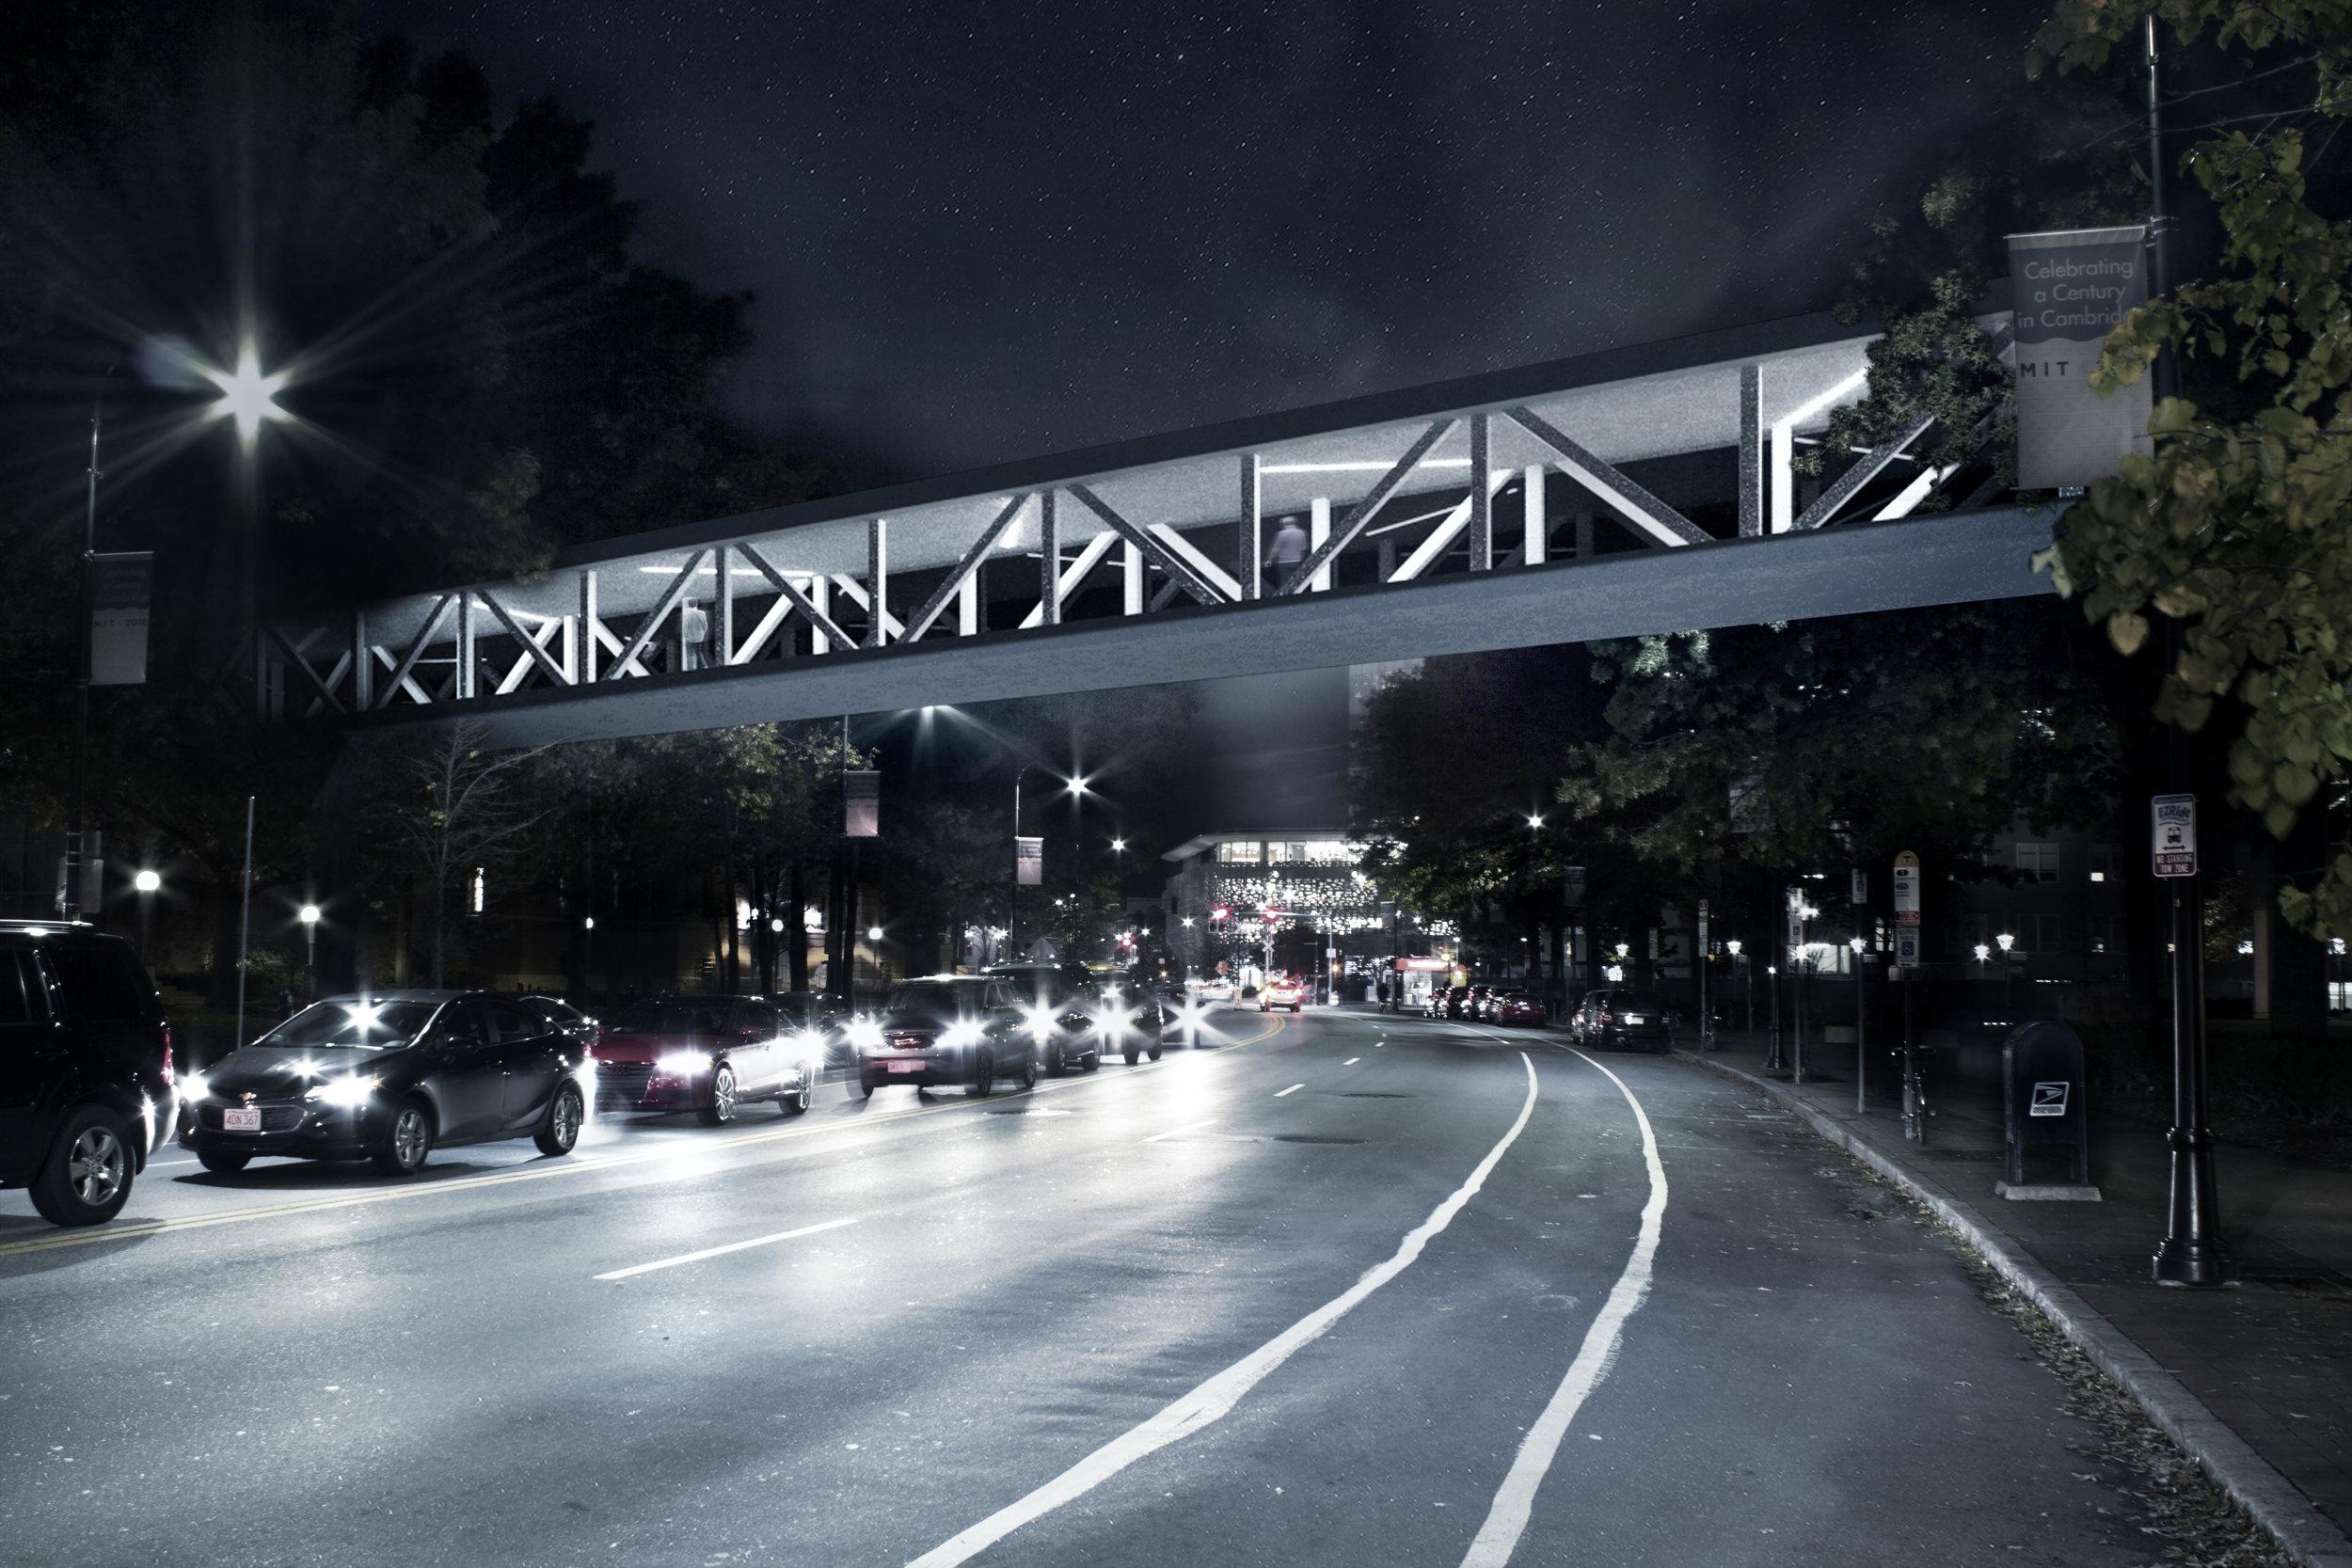 Night_Pedestrian Bridge.jpg